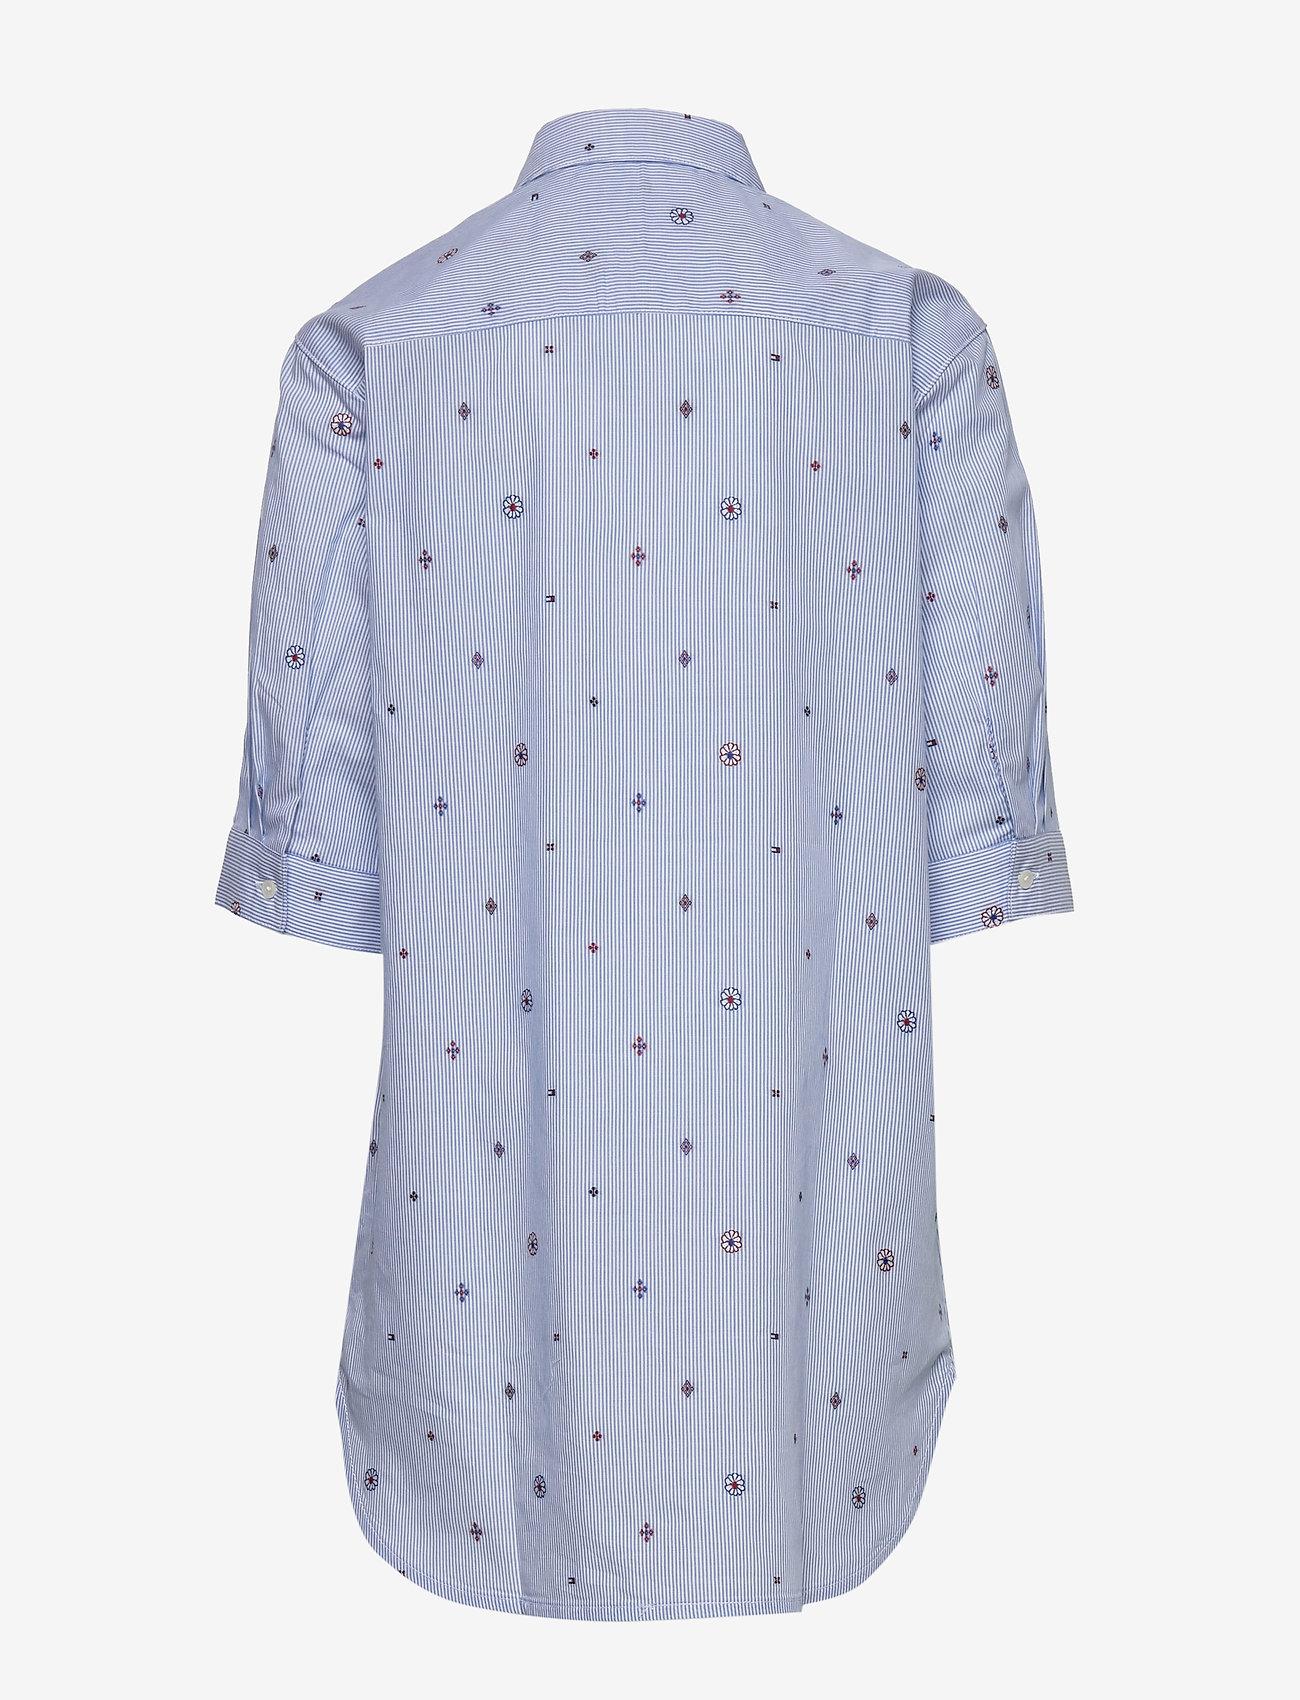 Tommy Hilfiger - LIGHT WOVEN DRESS S/S - robes - calm blue / stripe - 1